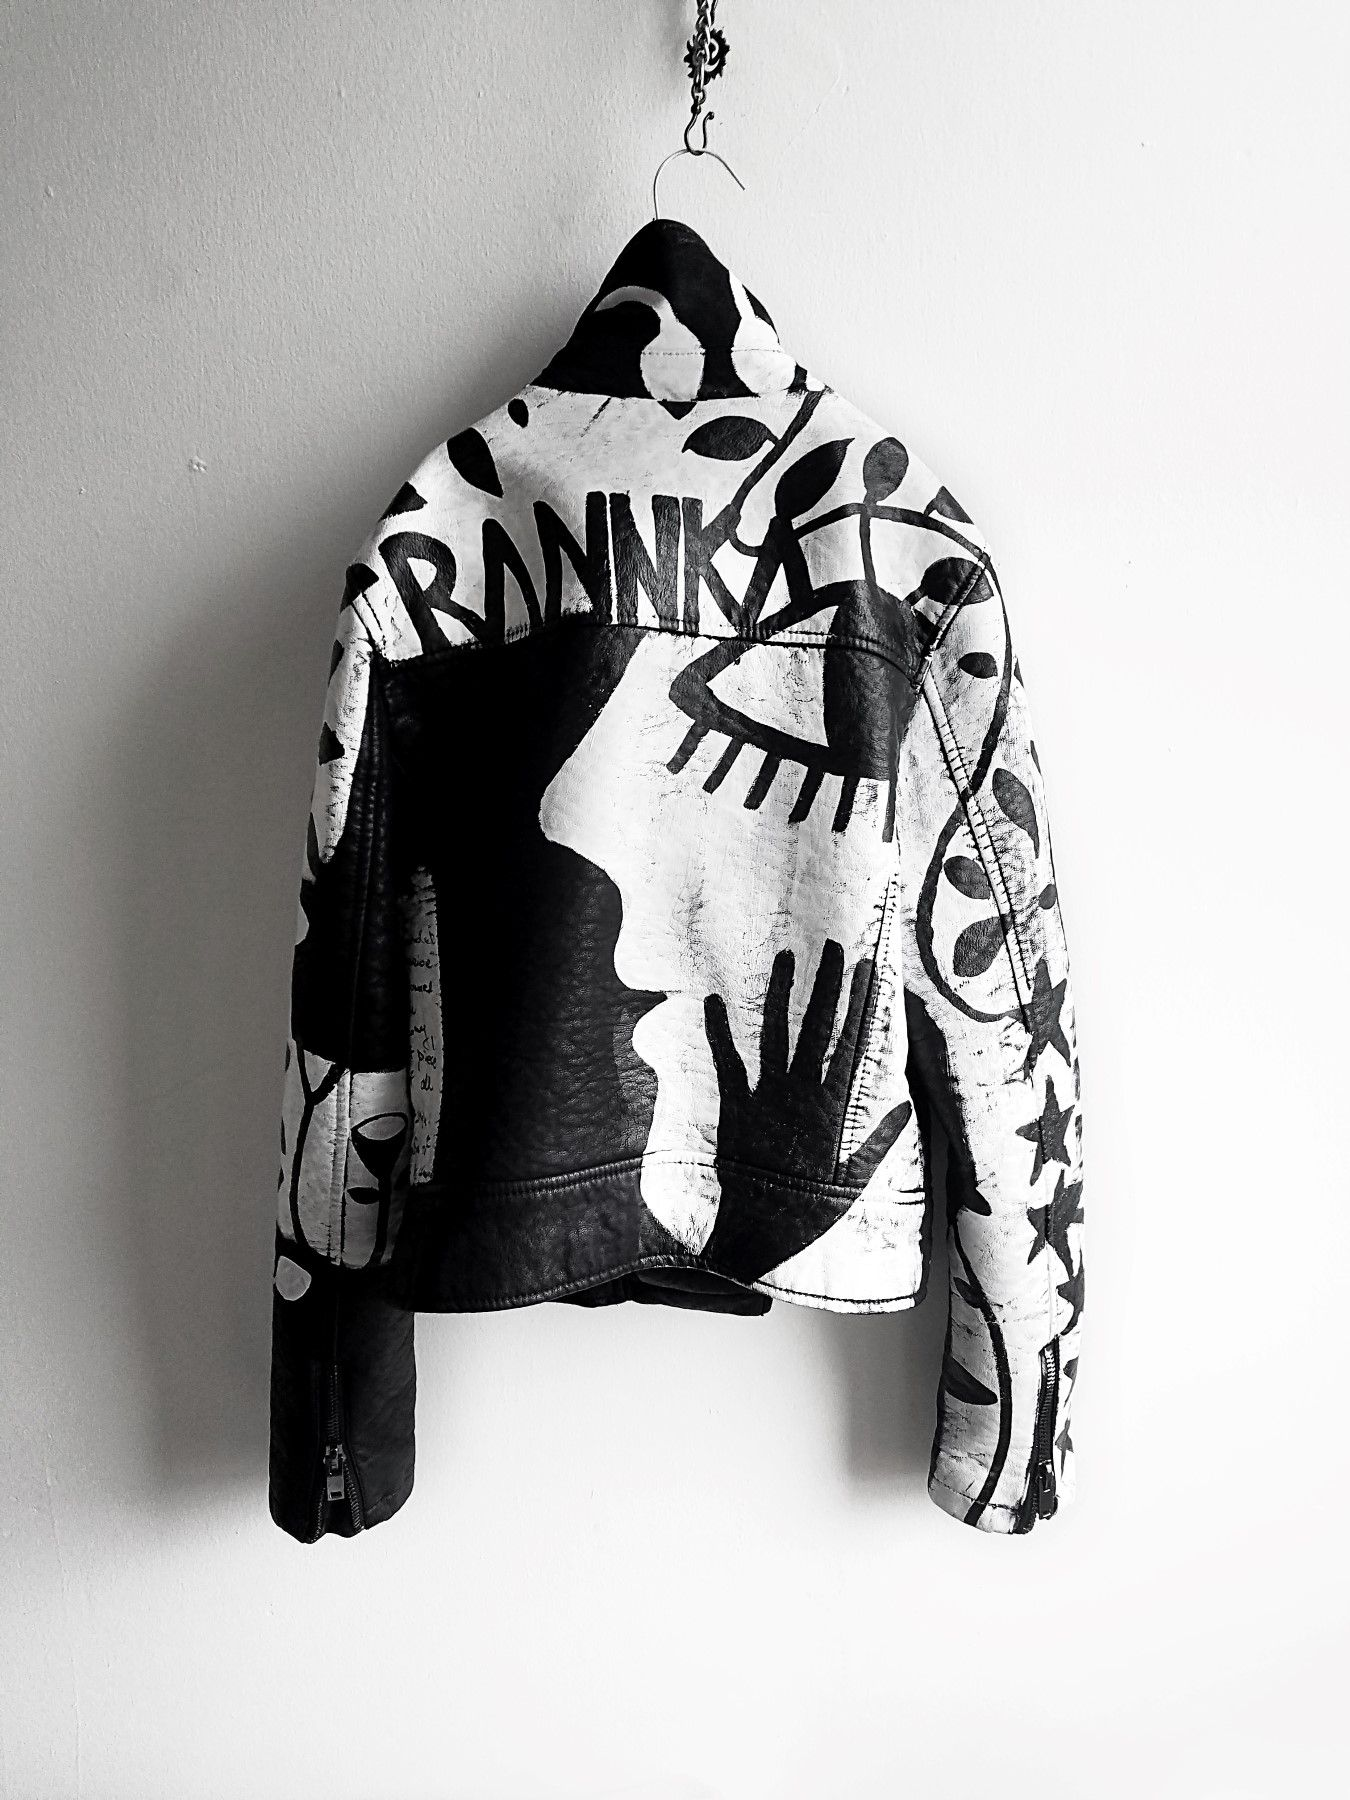 Rannka Hand Painted Jacket Painted Jacket Painted Leather Jacket Fashion [ 1800 x 1350 Pixel ]